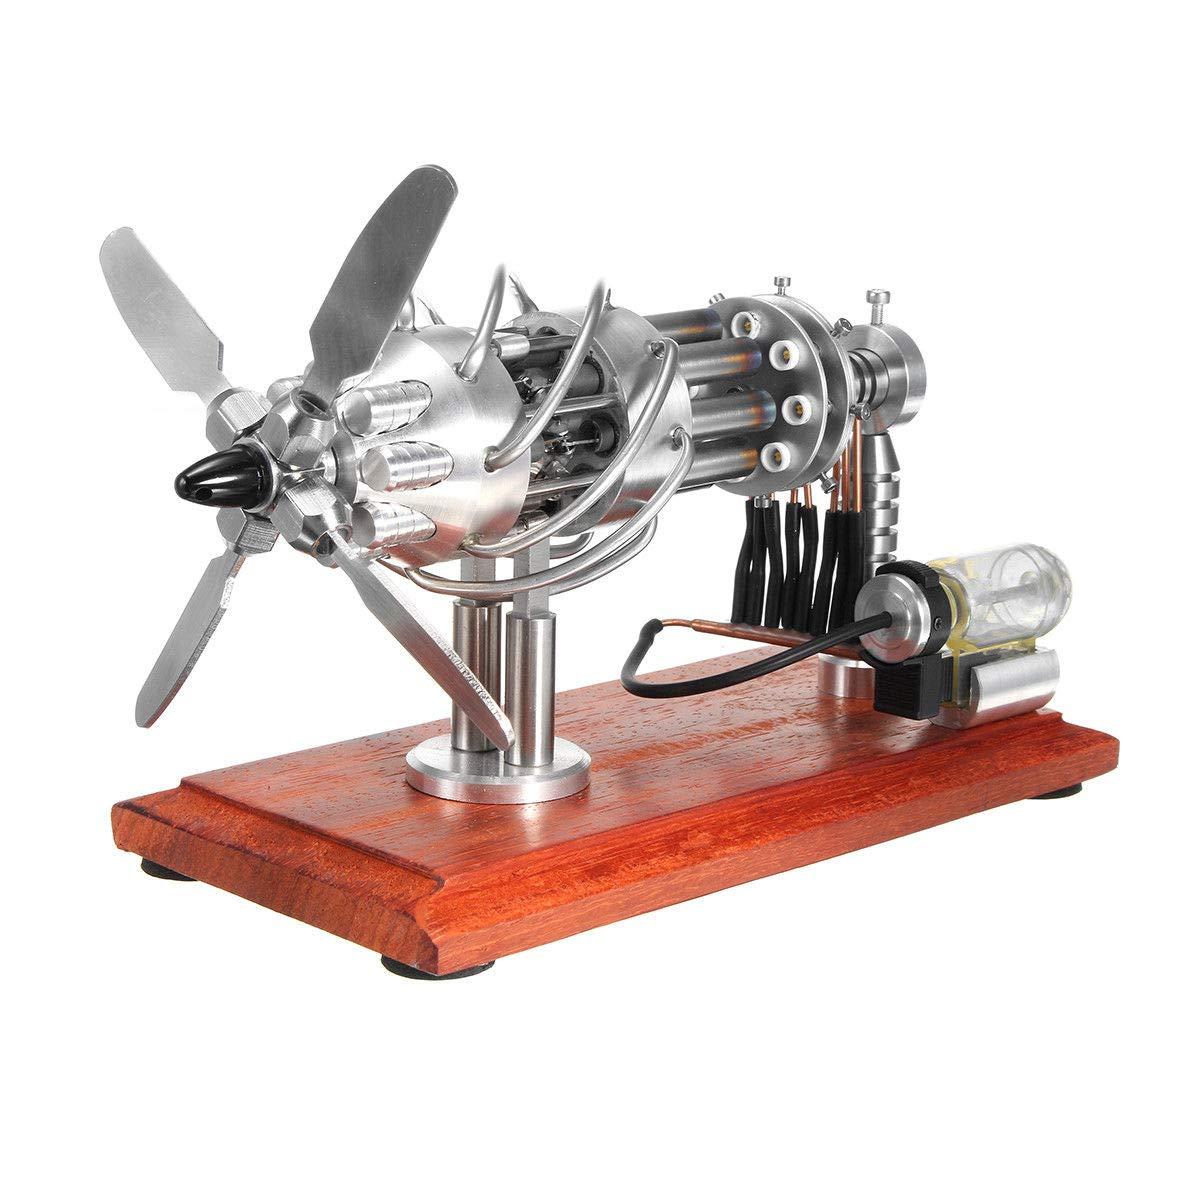 FidgetGear 16 Cylinder Hot Air Stirling Engine Motor Creative Steam Power Education Model